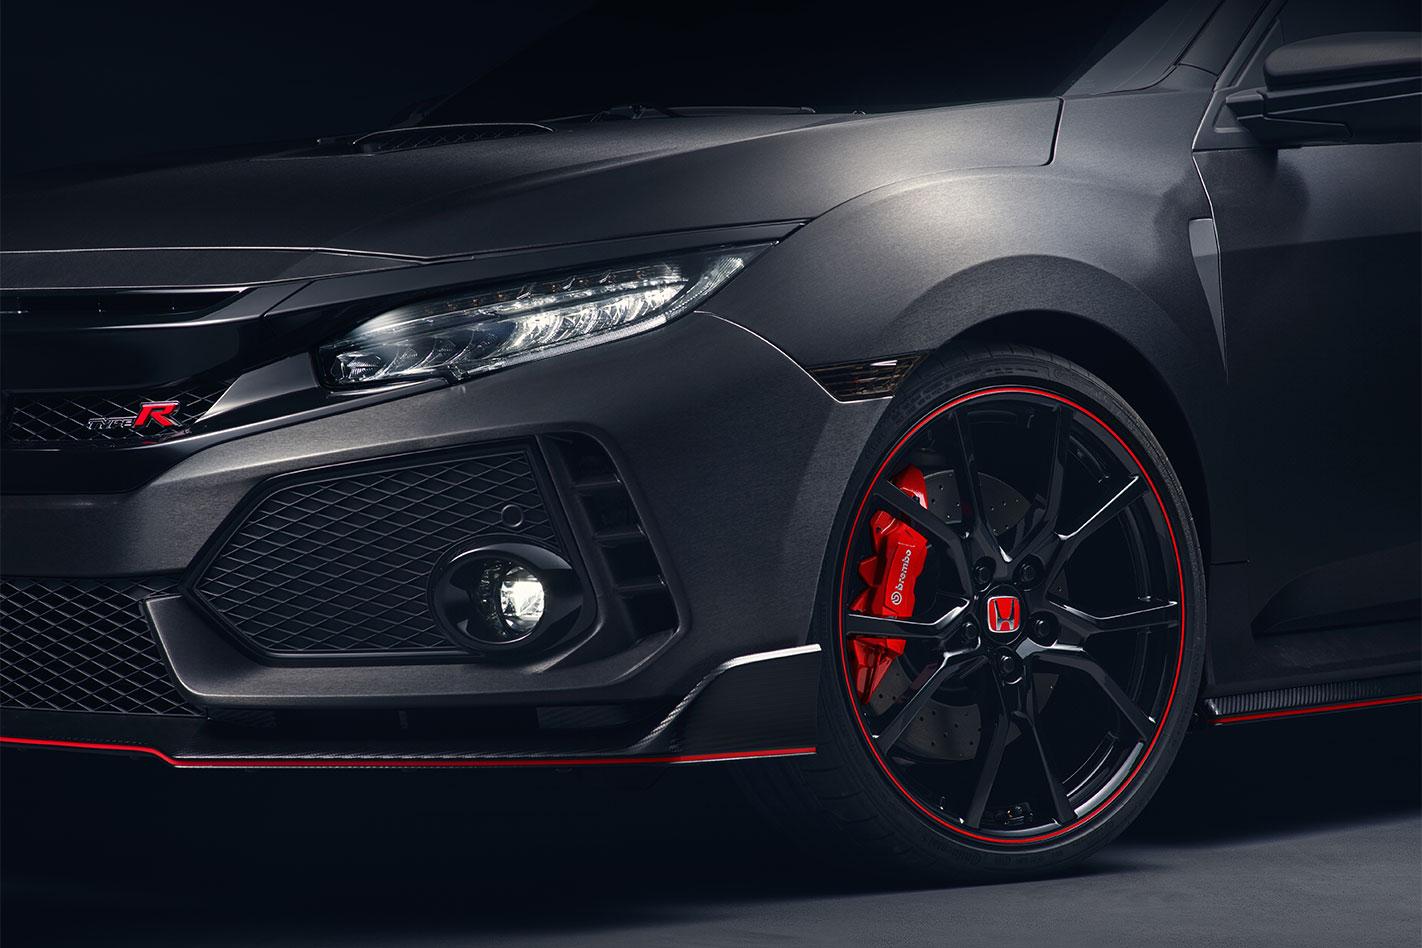 2017 Honda Civic Type R wheel